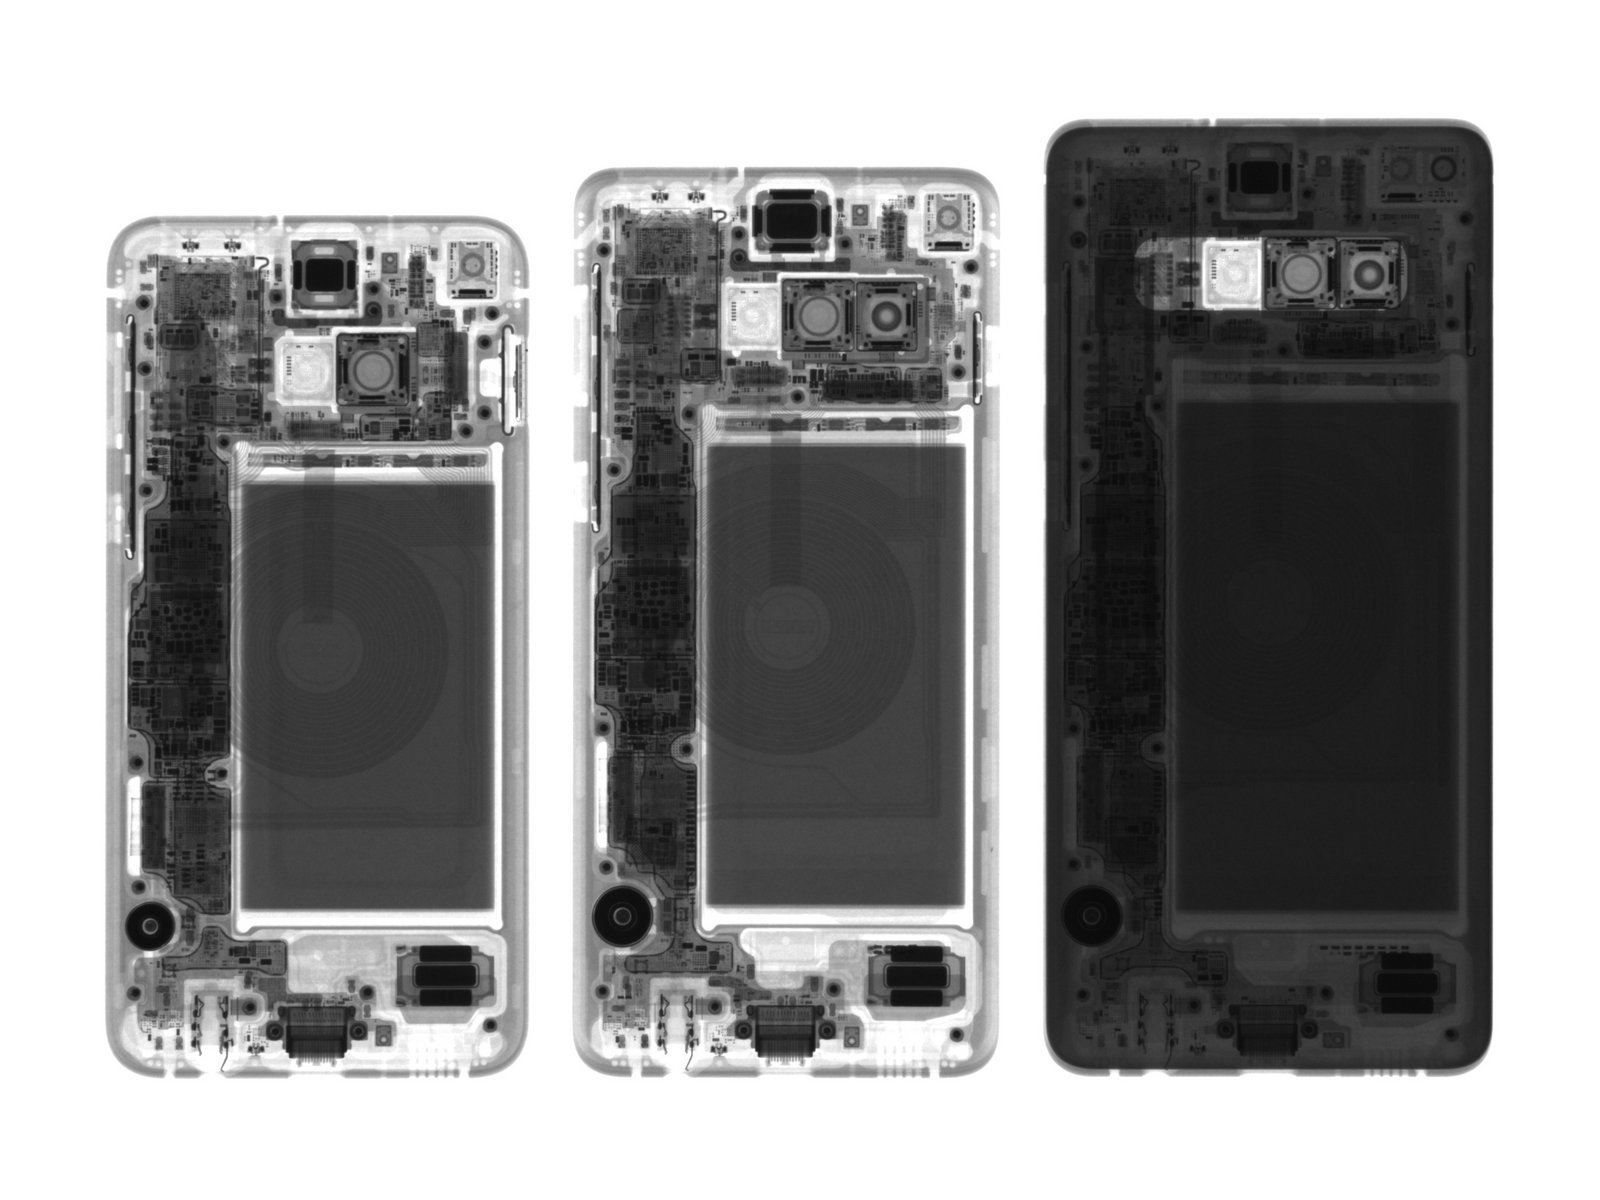 Samsung Galaxy S10 разобрали на кусочки